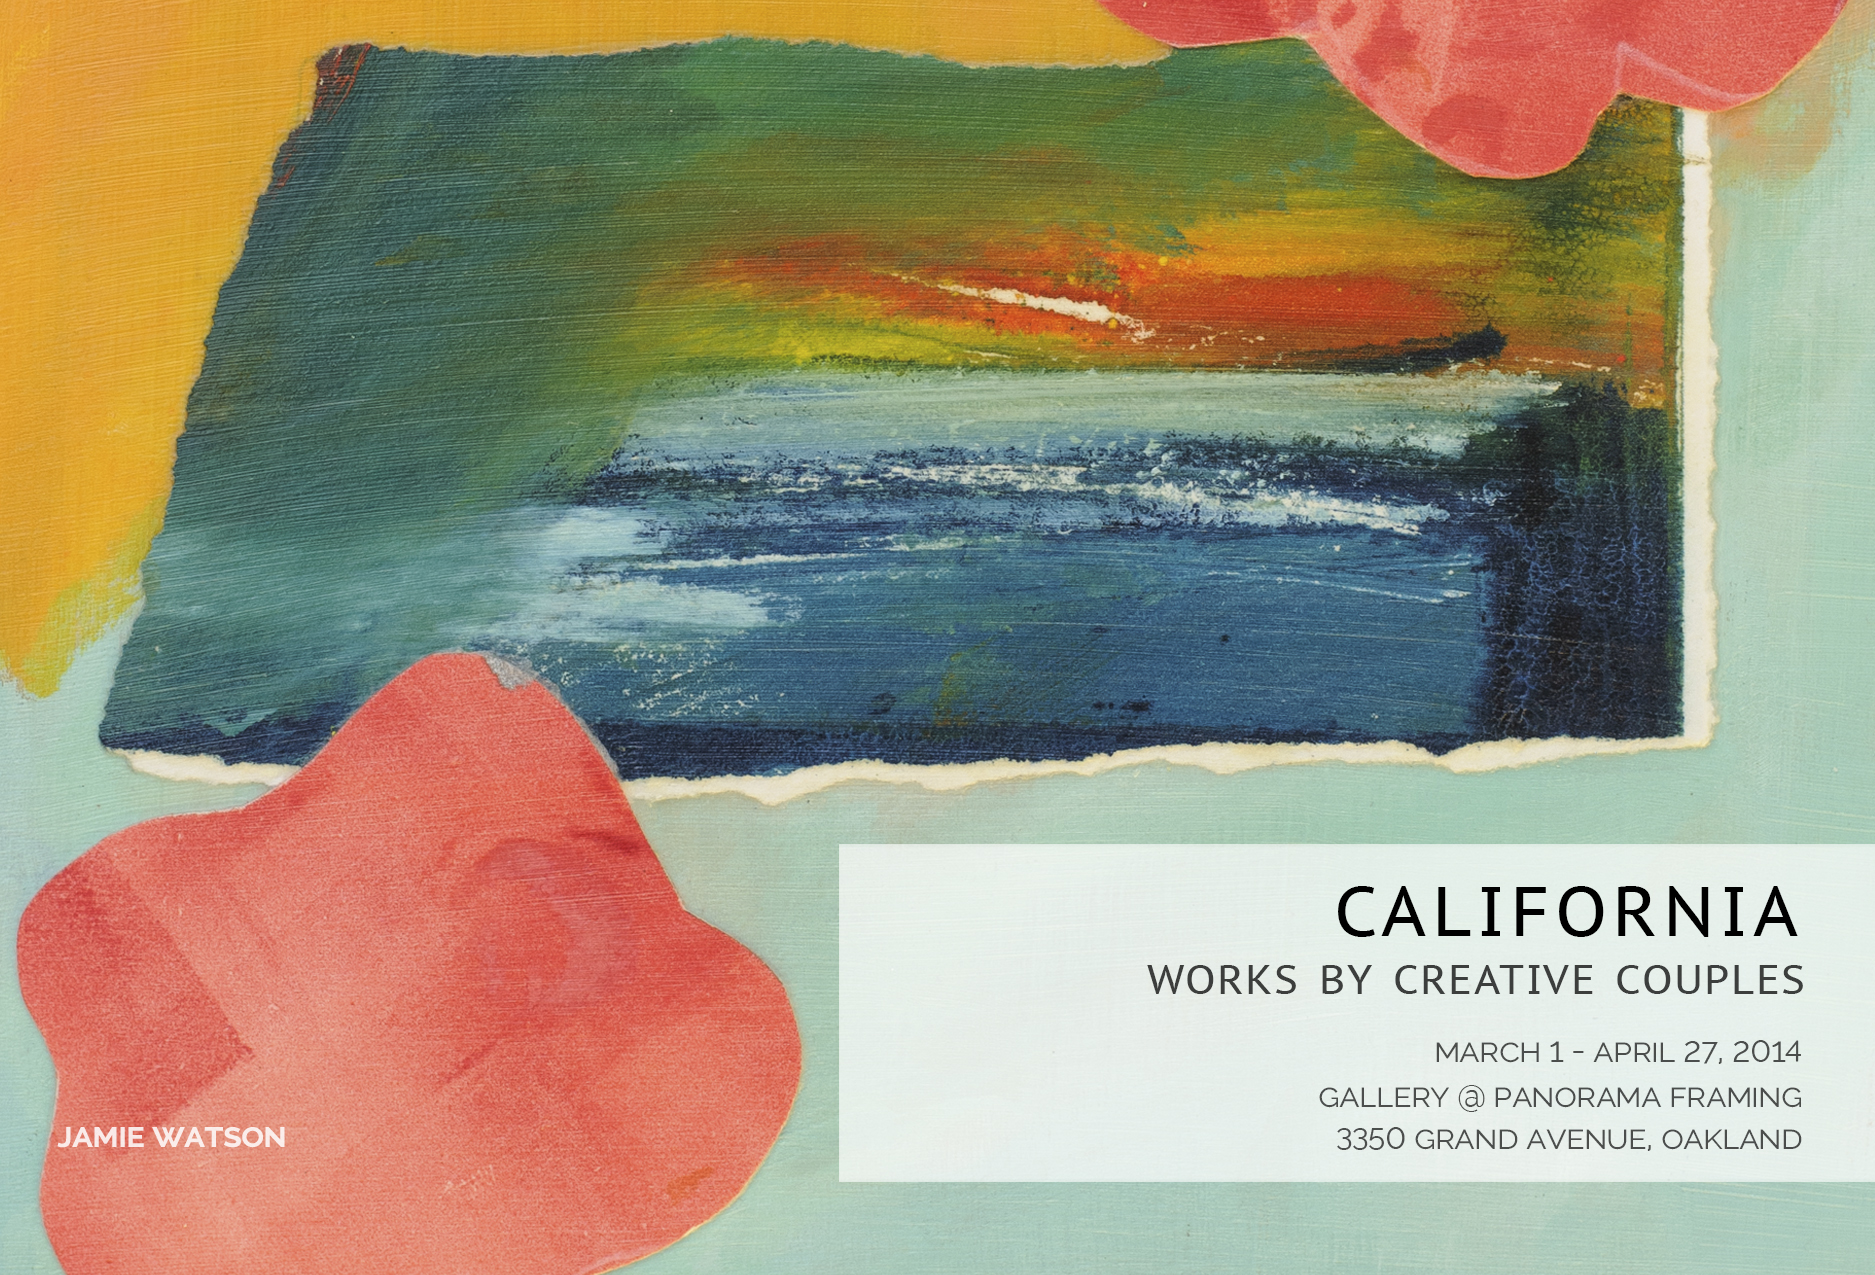 California (Jamie Watson image)